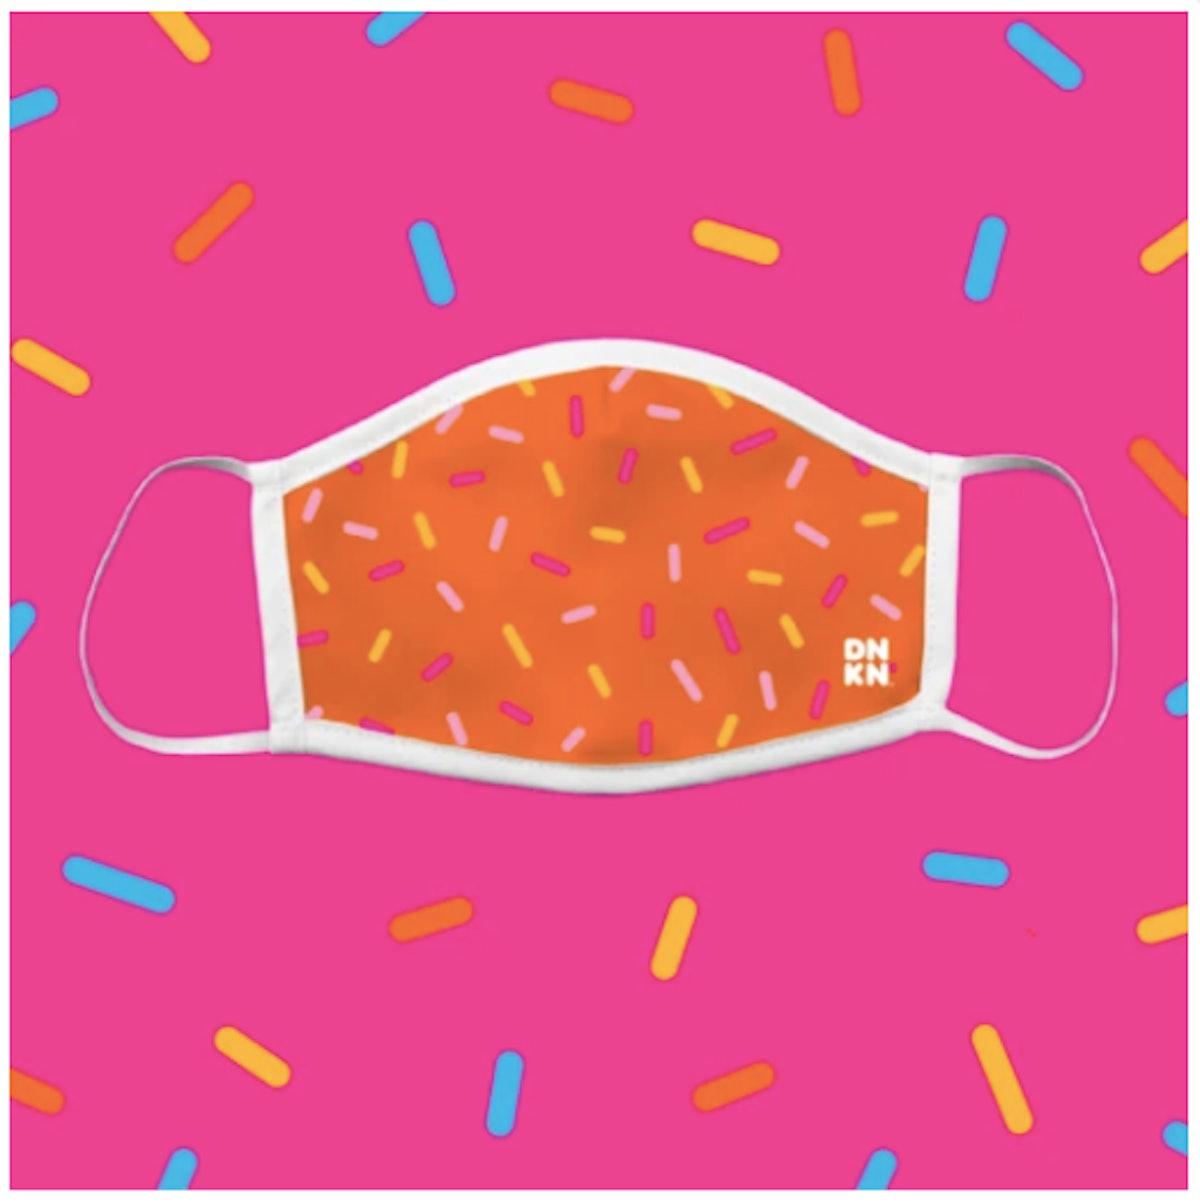 Dunkin' Orange Sprinkled With Joy Mask